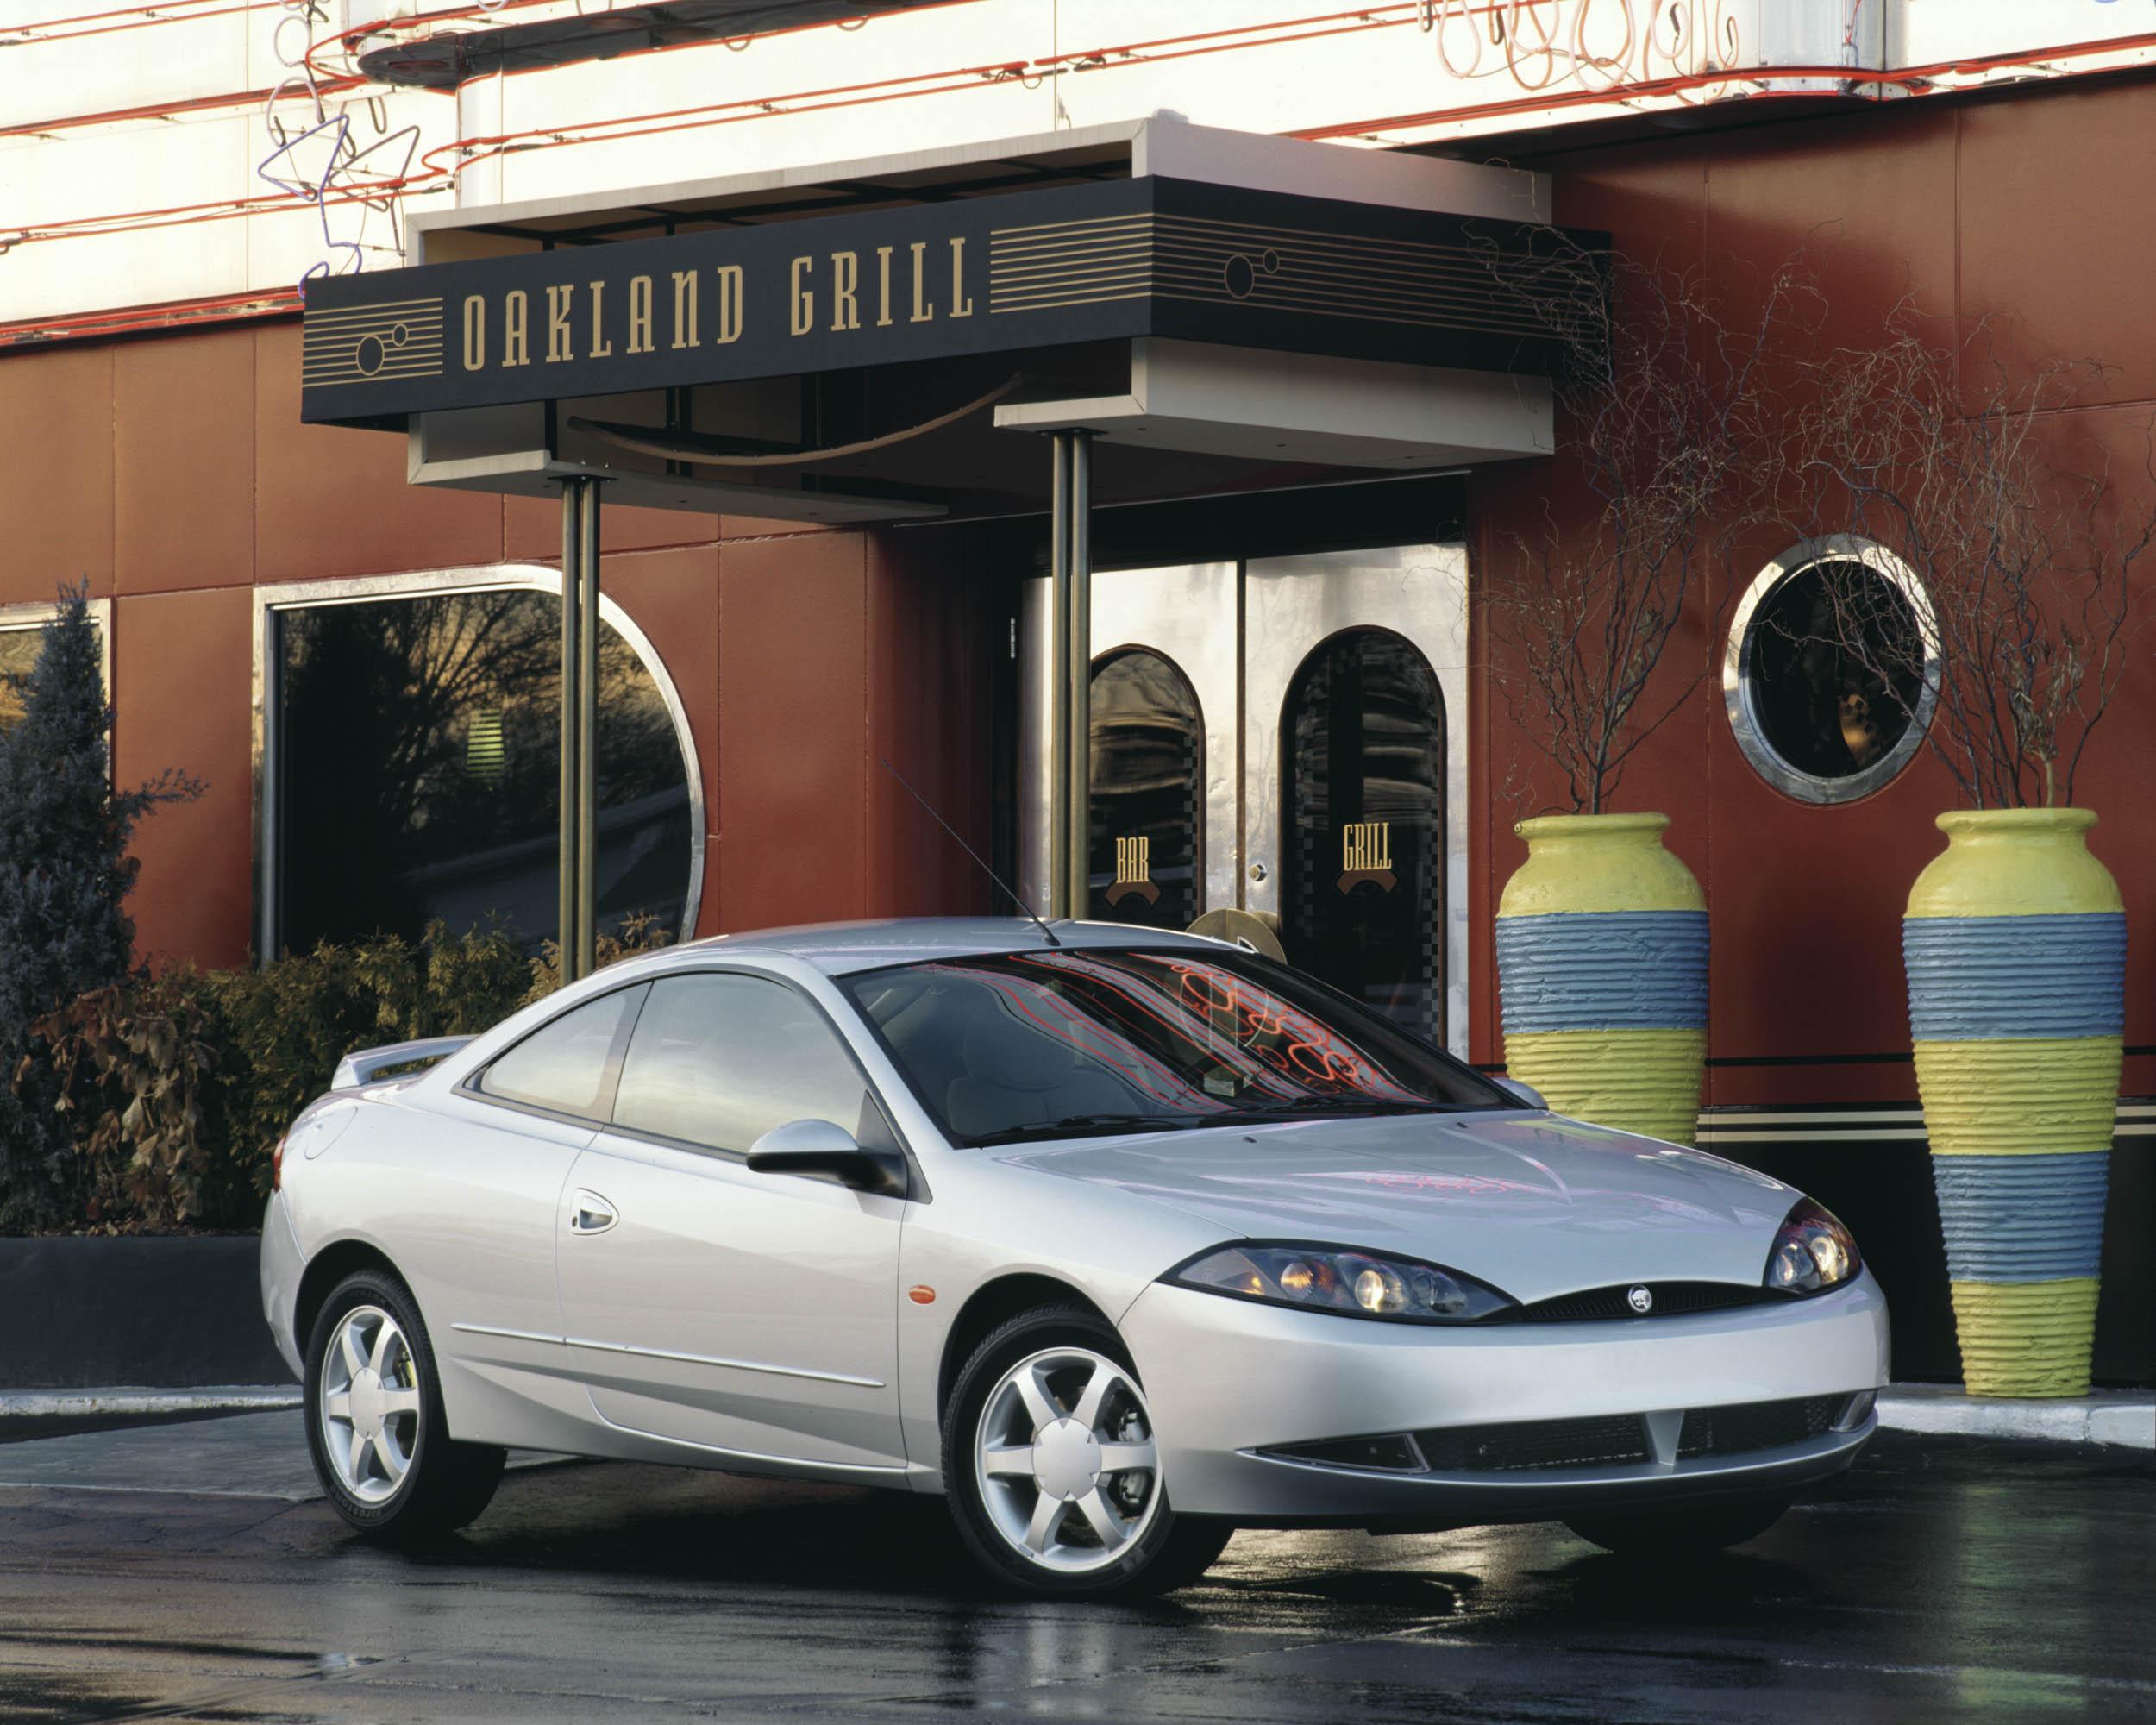 1999 Mercury Cougar front 3/4